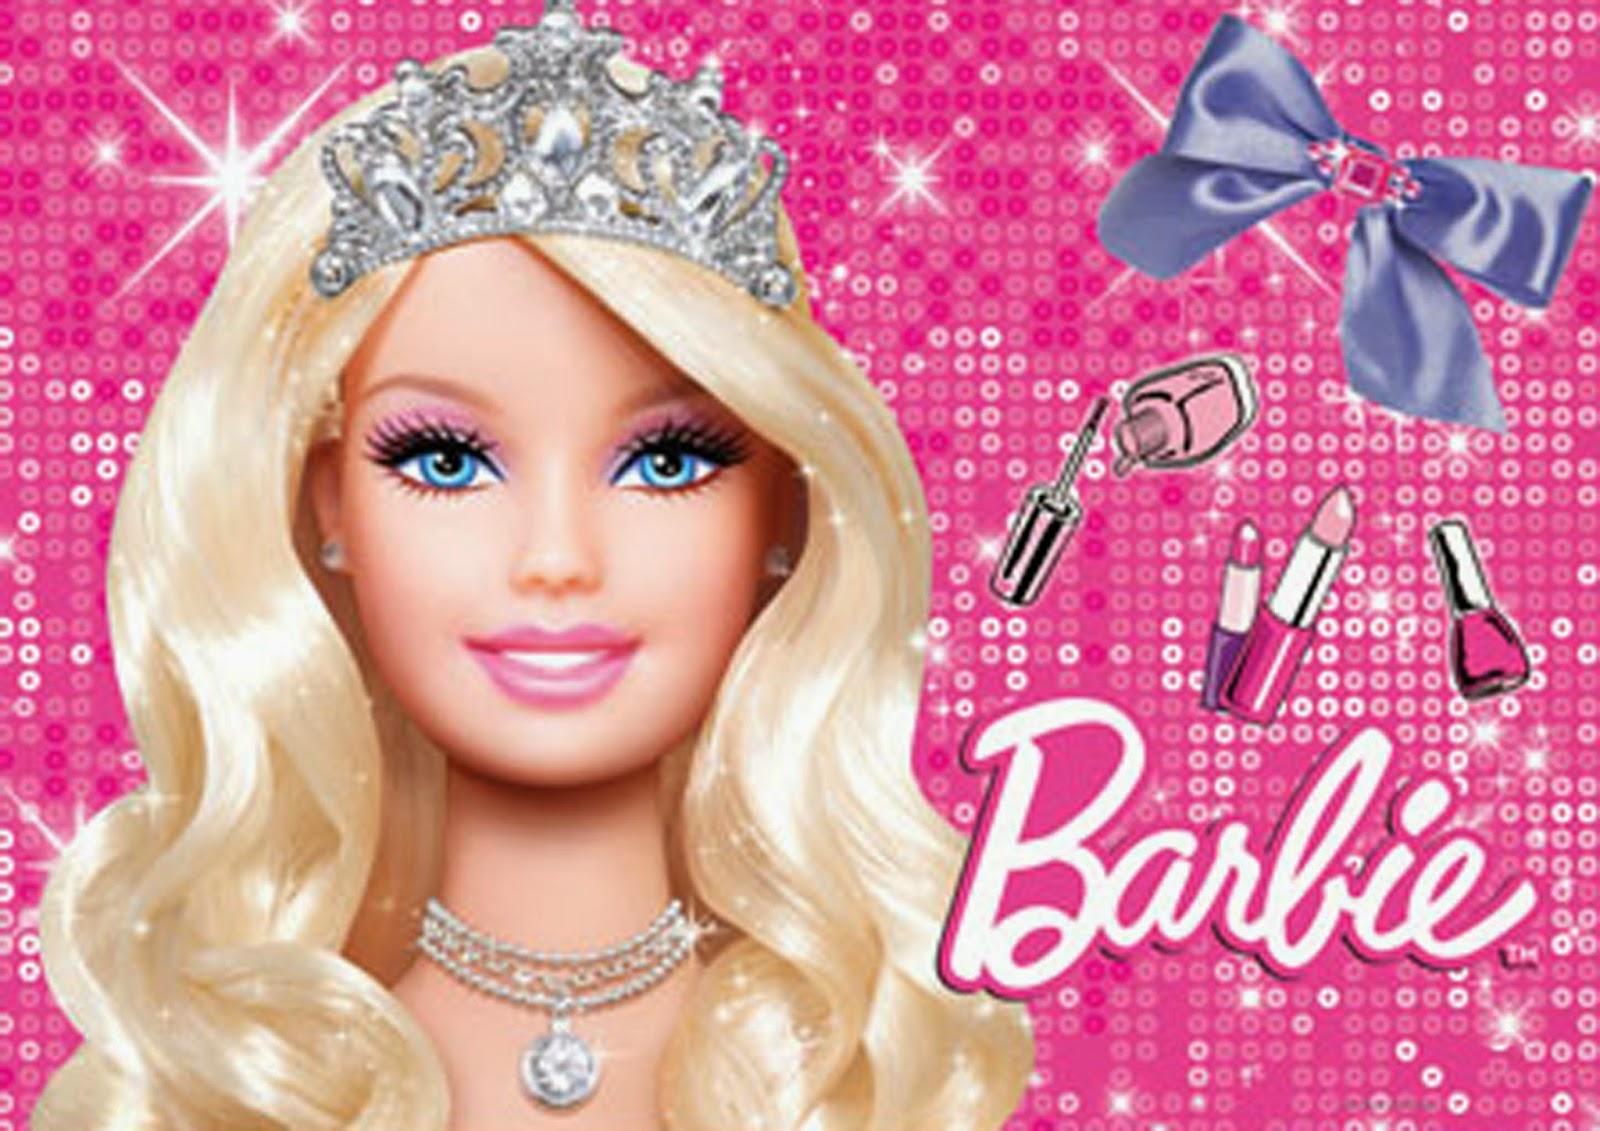 Barbie Wallpapers Desktop Wallpaper Hungama 1600x1131